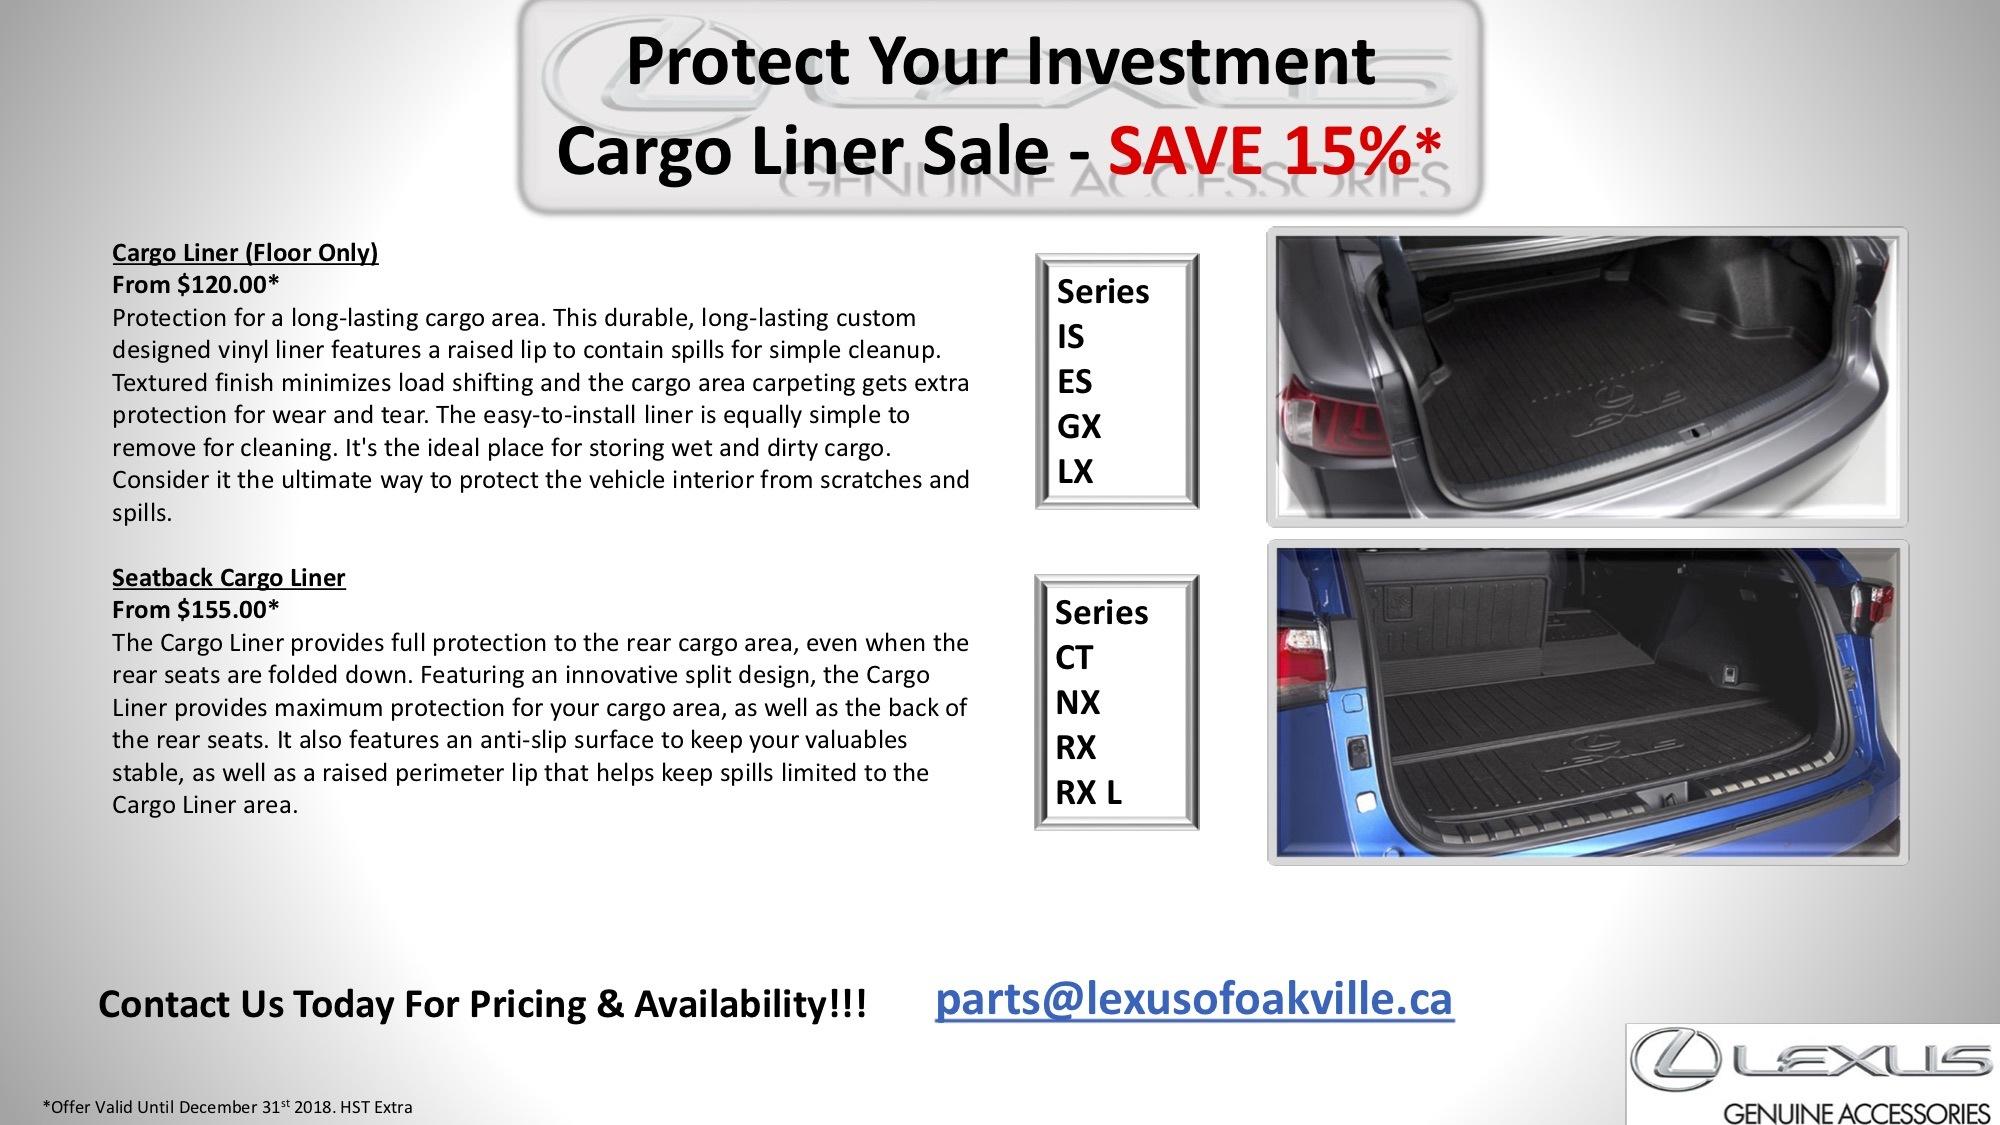 Cargo Liner Sale